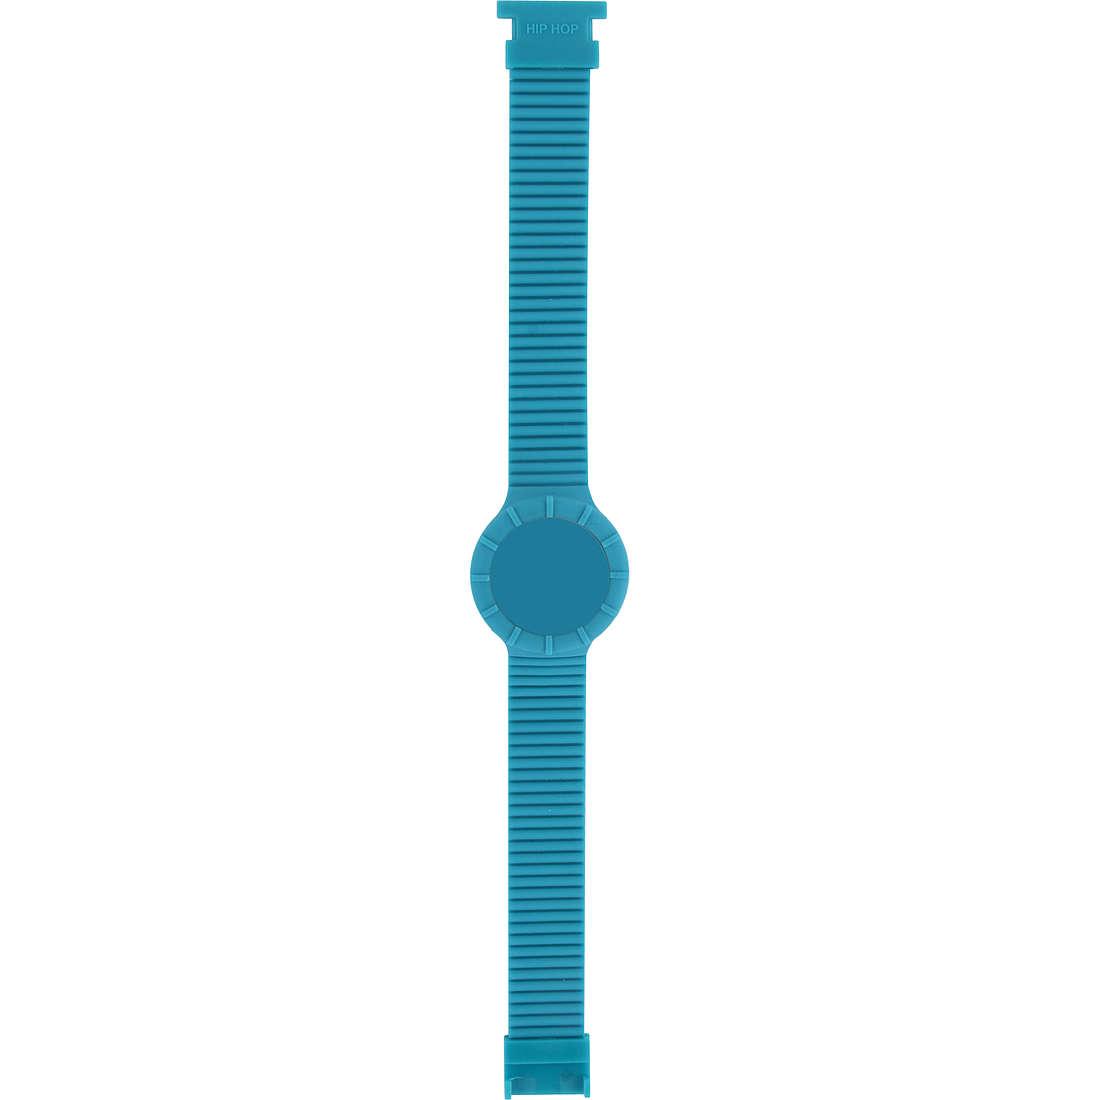 orologio accessorio unisex Hip Hop Hero HBU0257